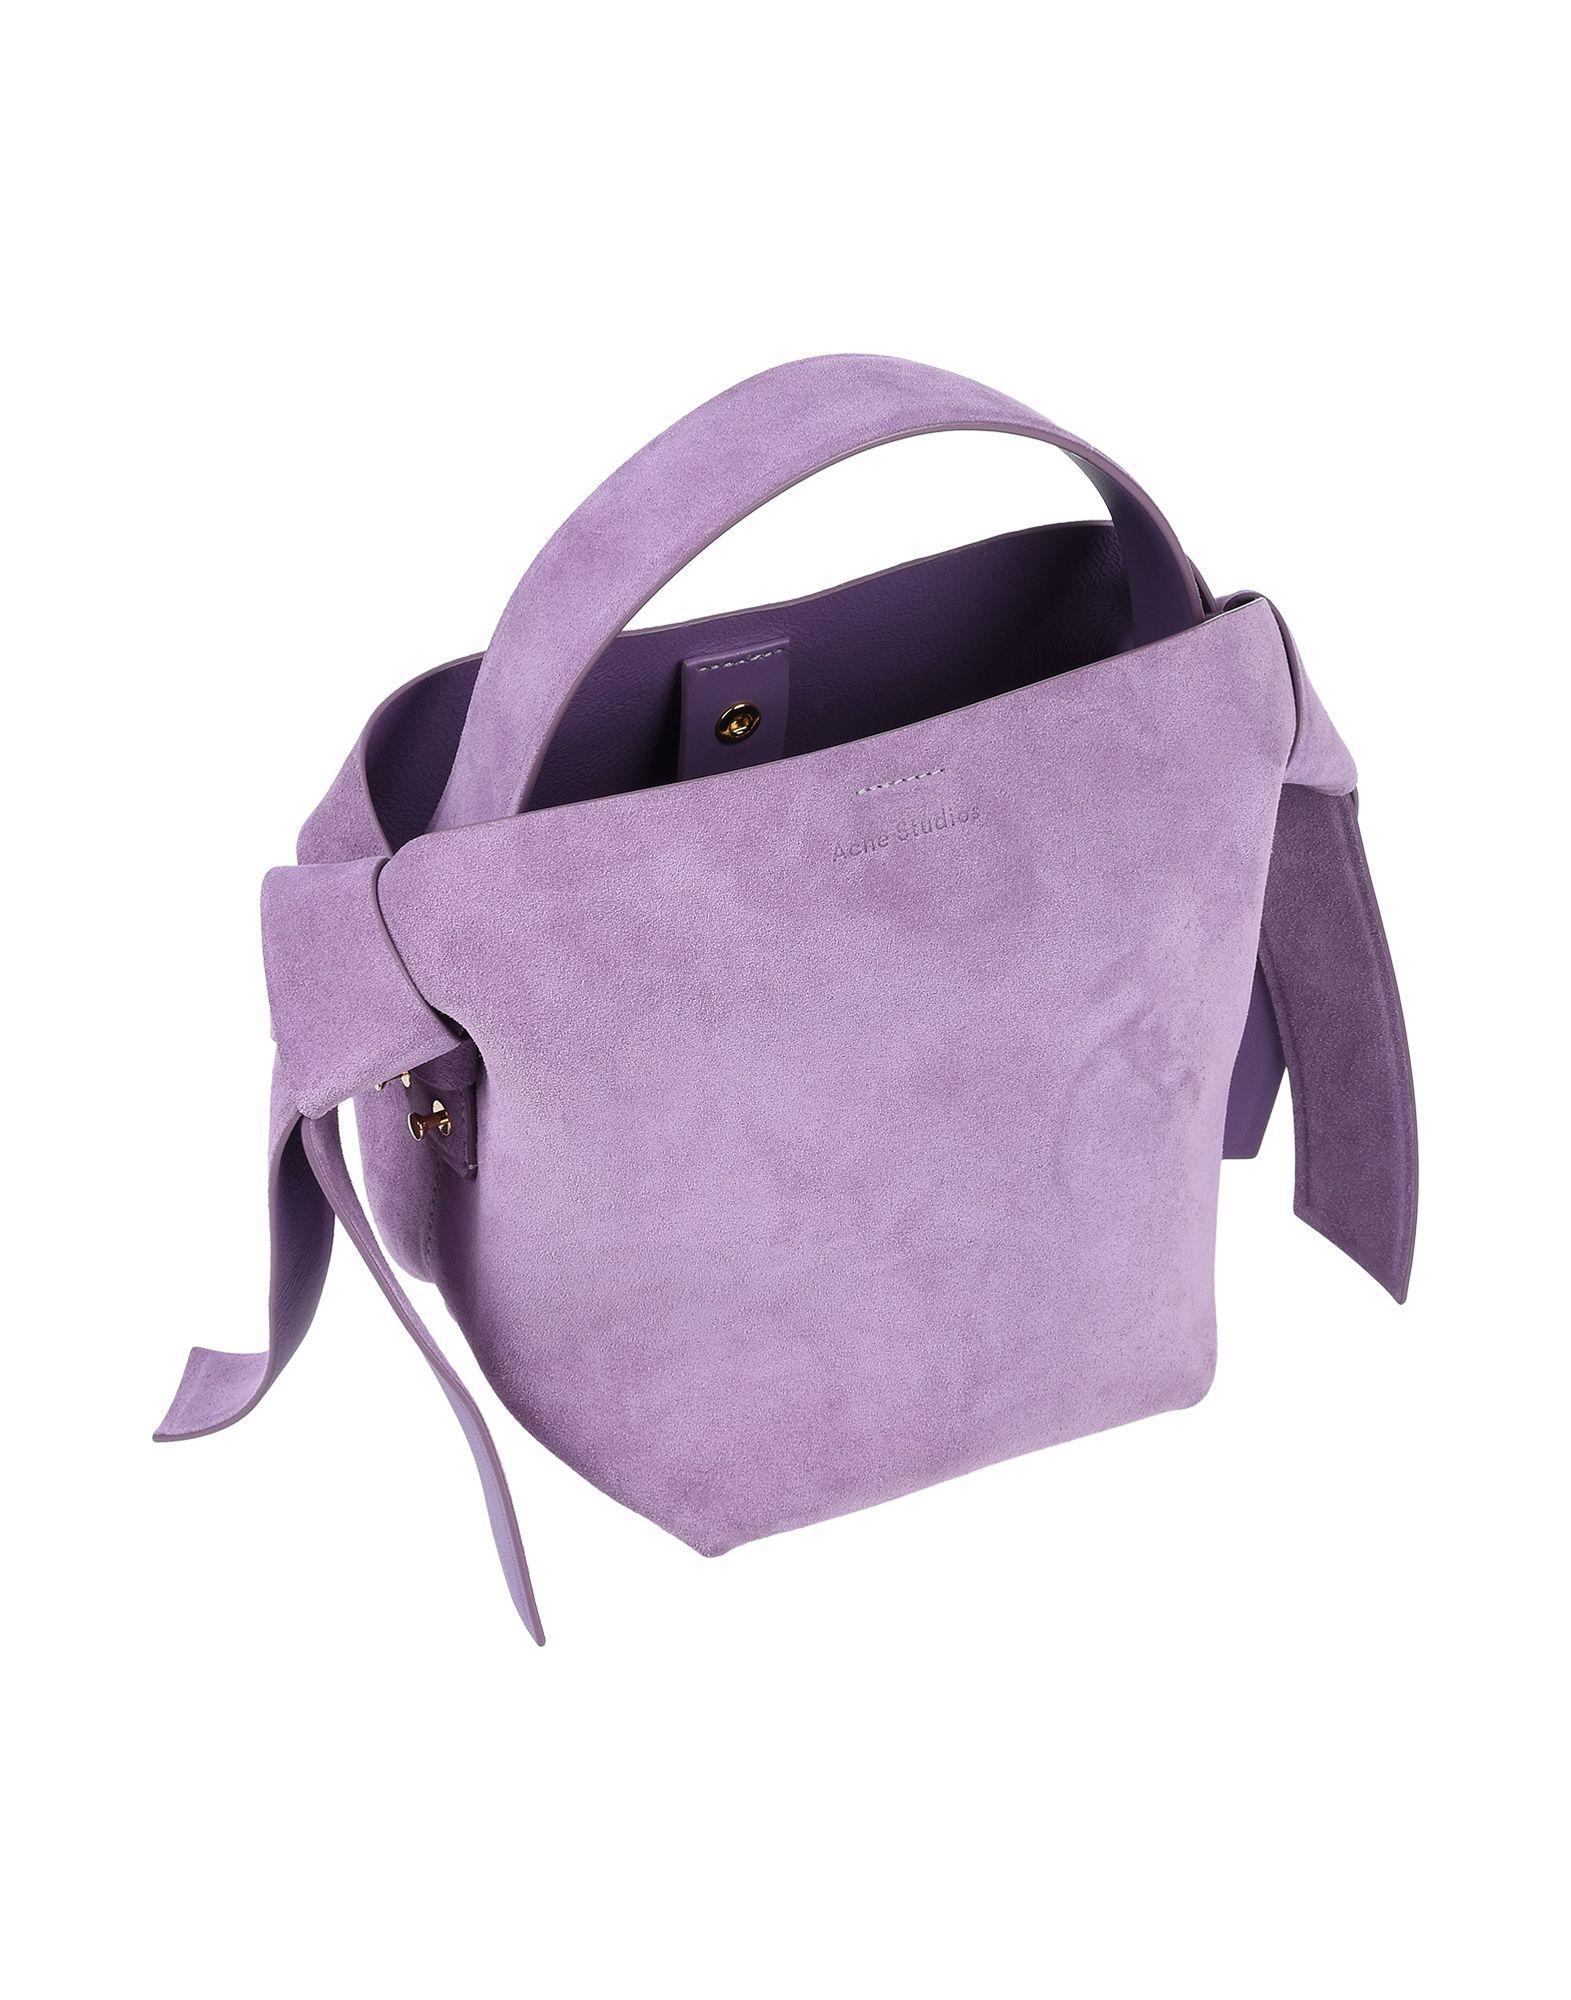 Acne Studios Handtaschen in Lila r80nj